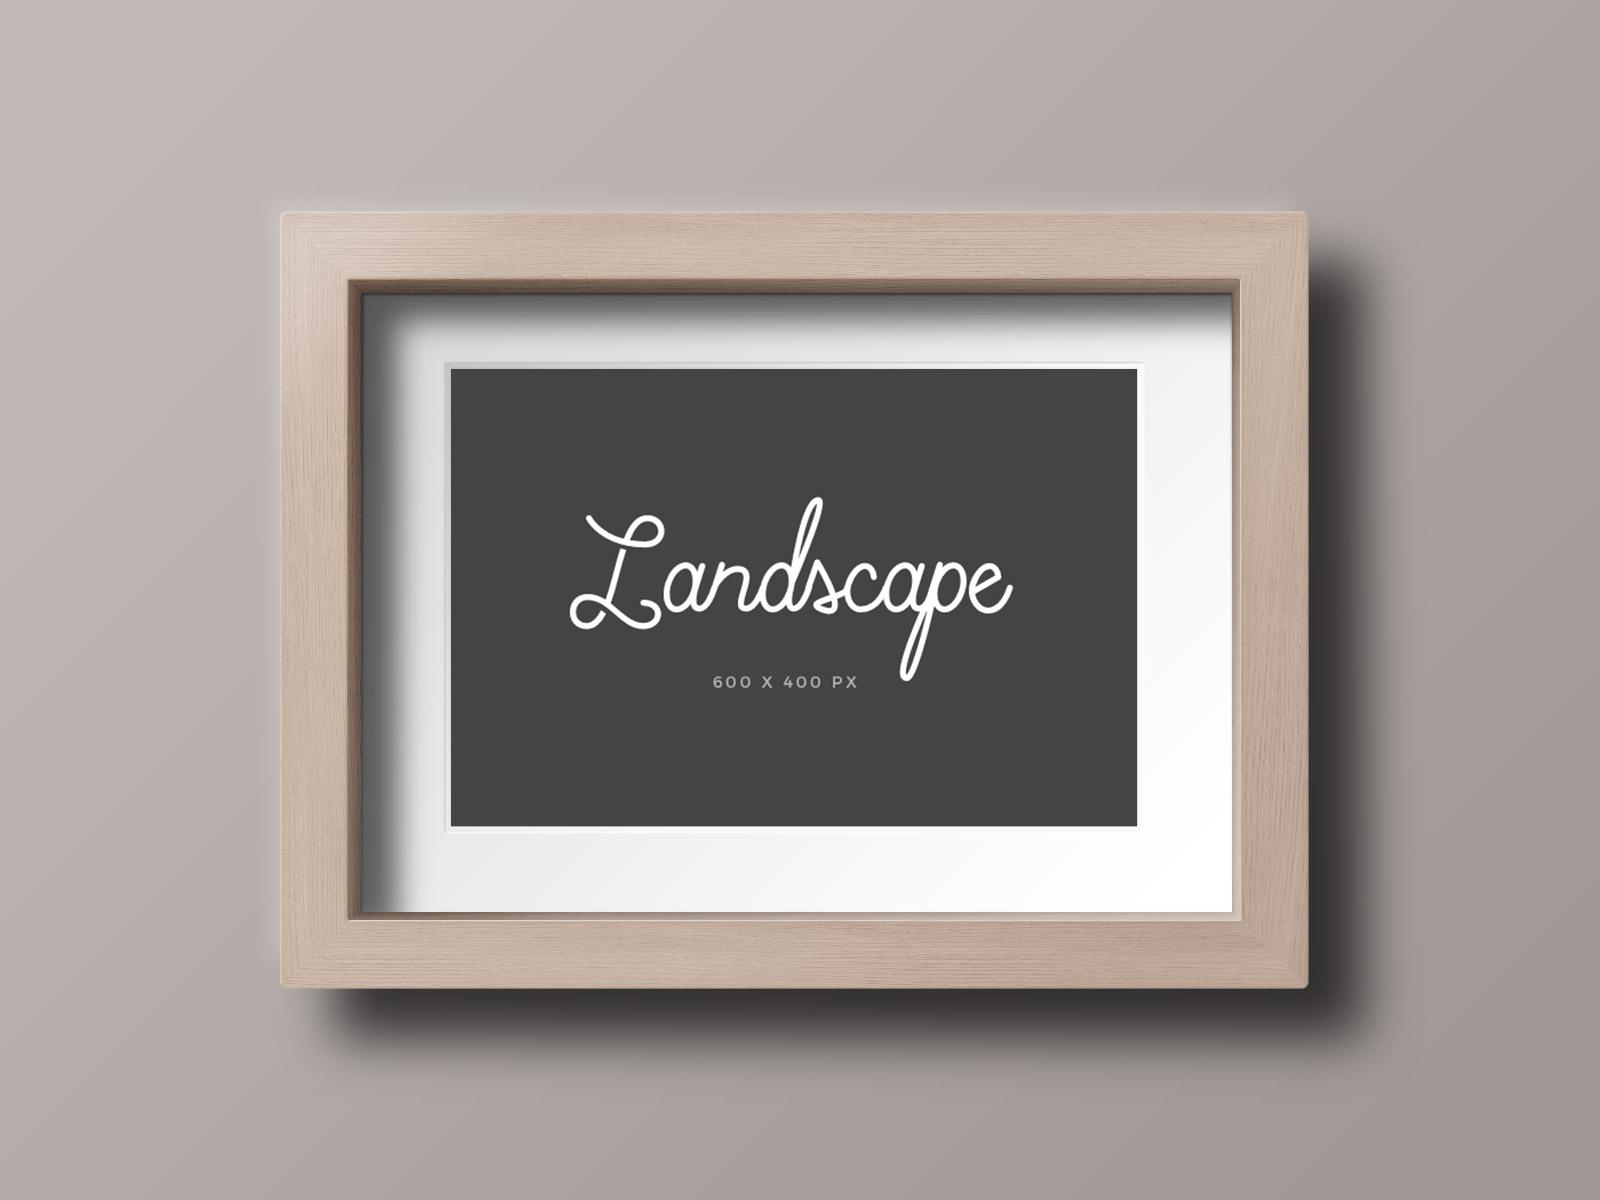 Design Your Landscape